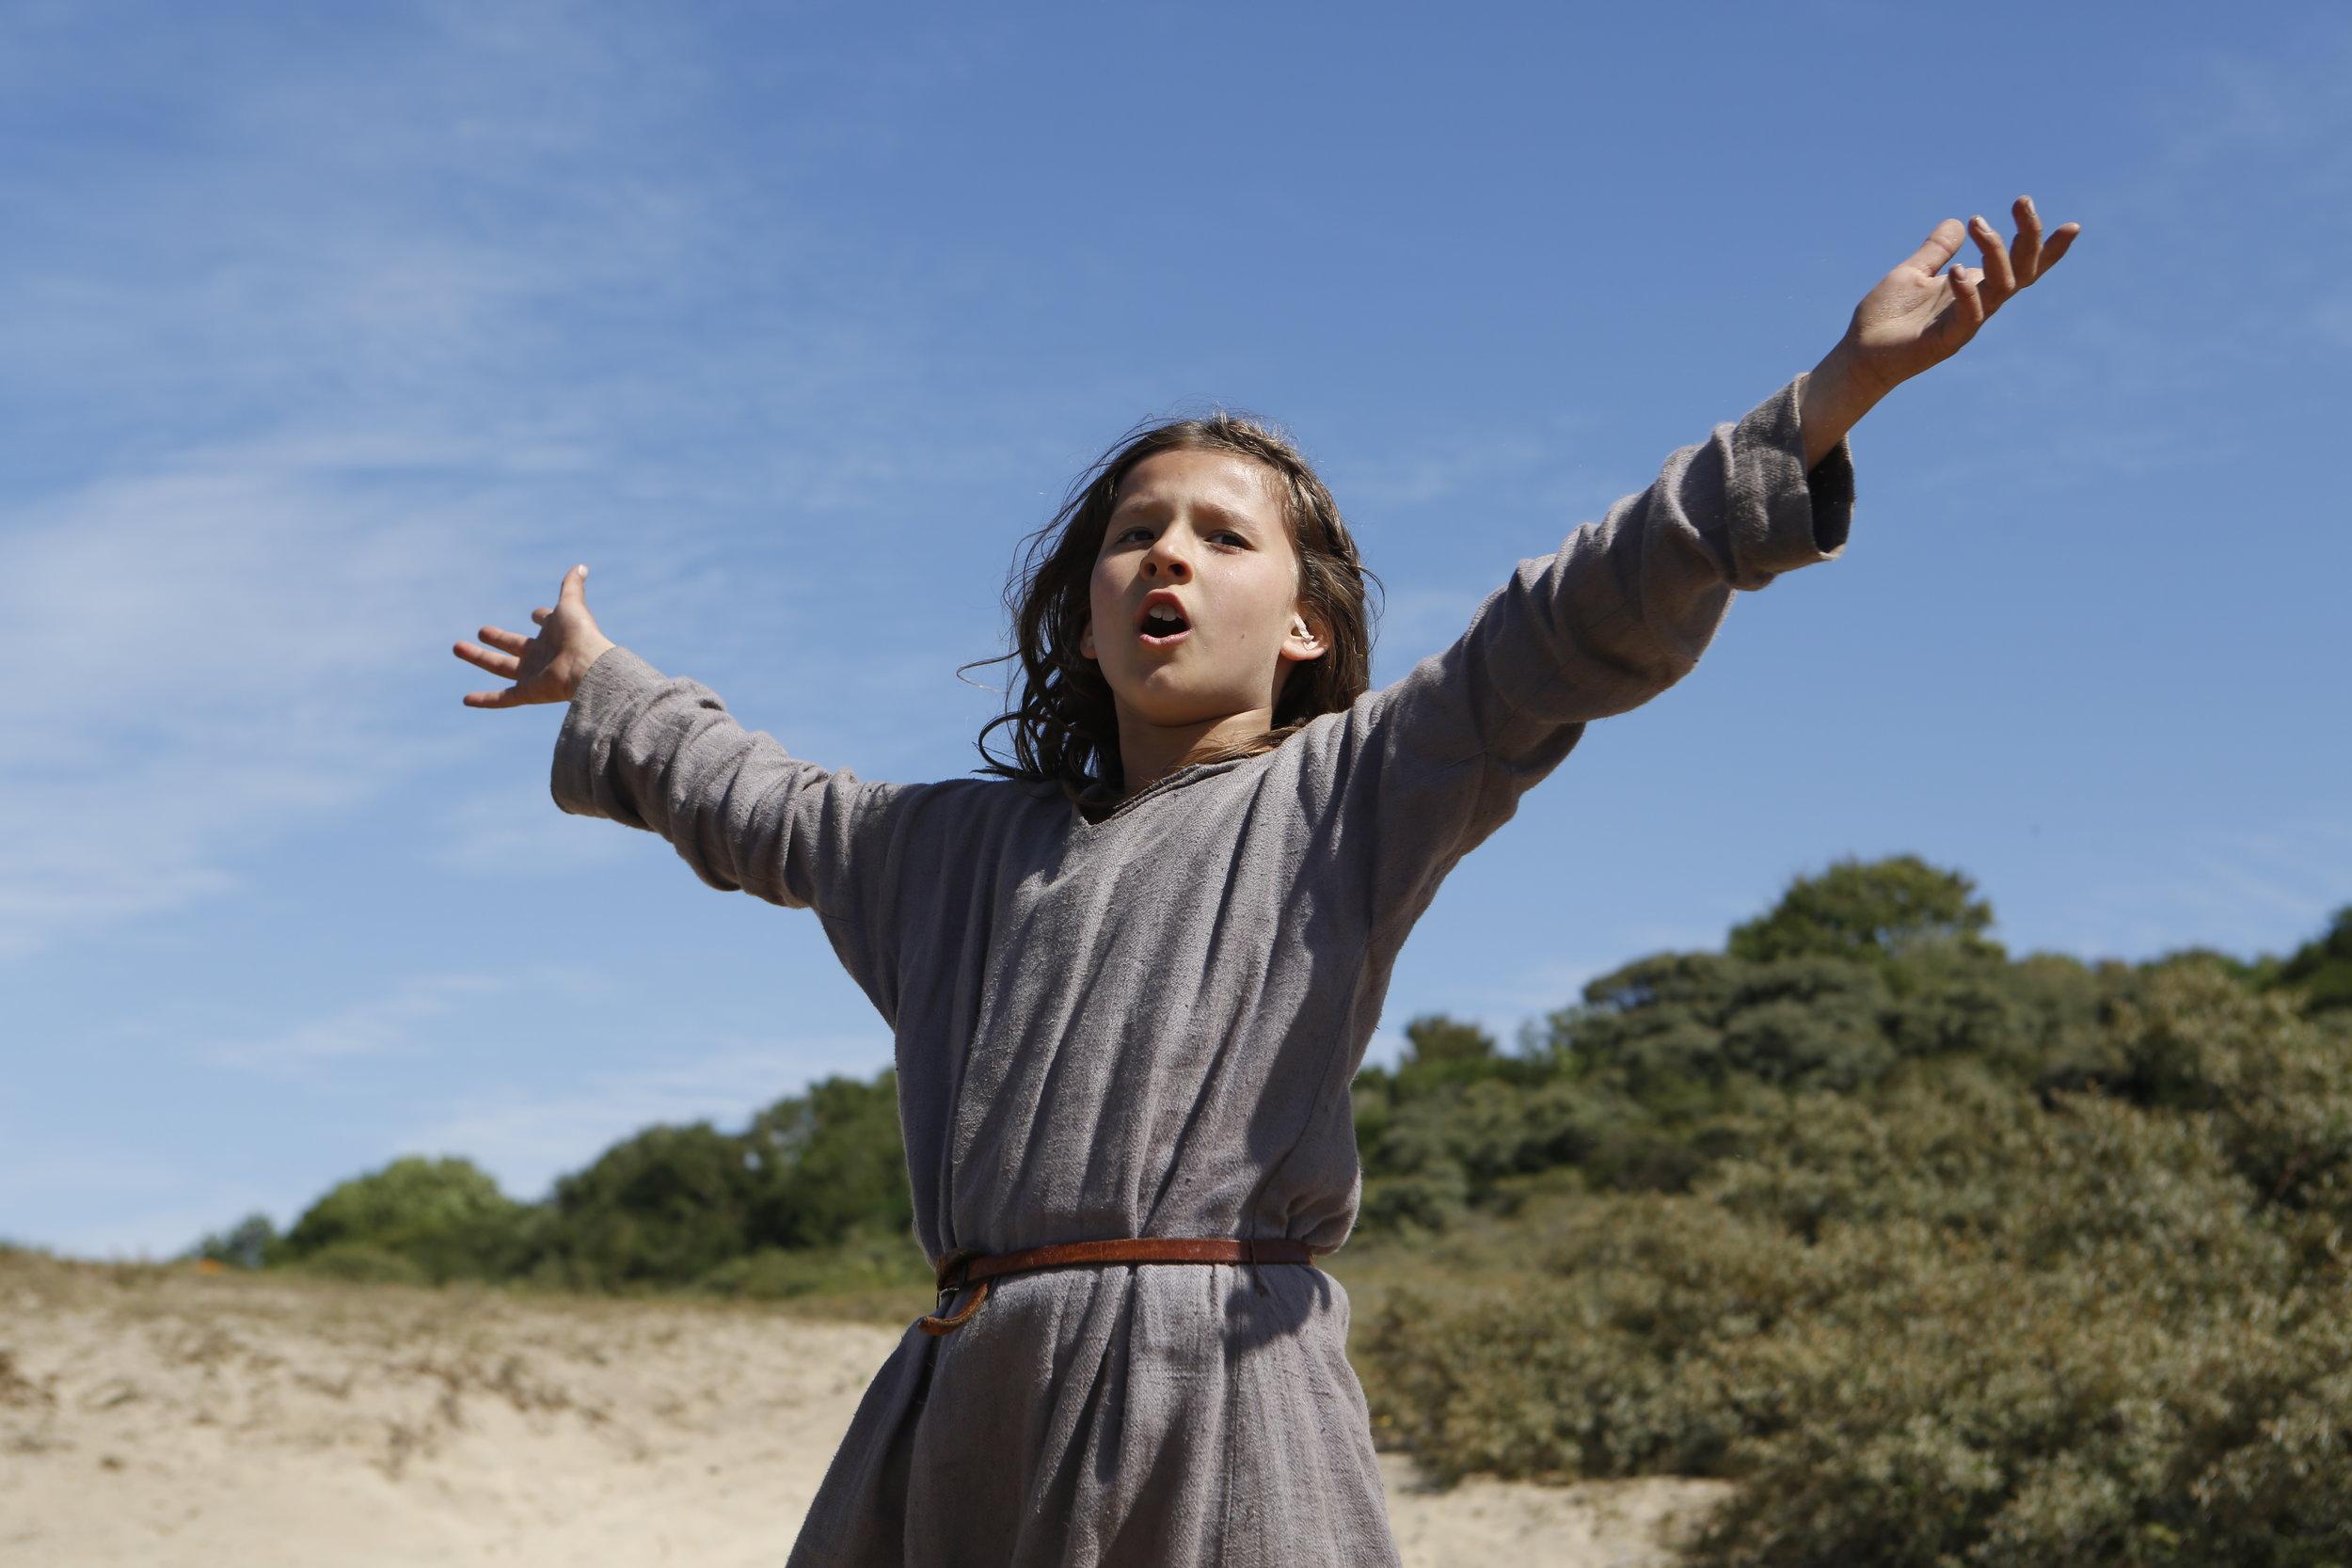 JEANNETTE, L'ENFANCE DE JEANNE D'ARC_Photographe.R.Arpajou©TAOS Films - ARTE France_ARP6631.JPG